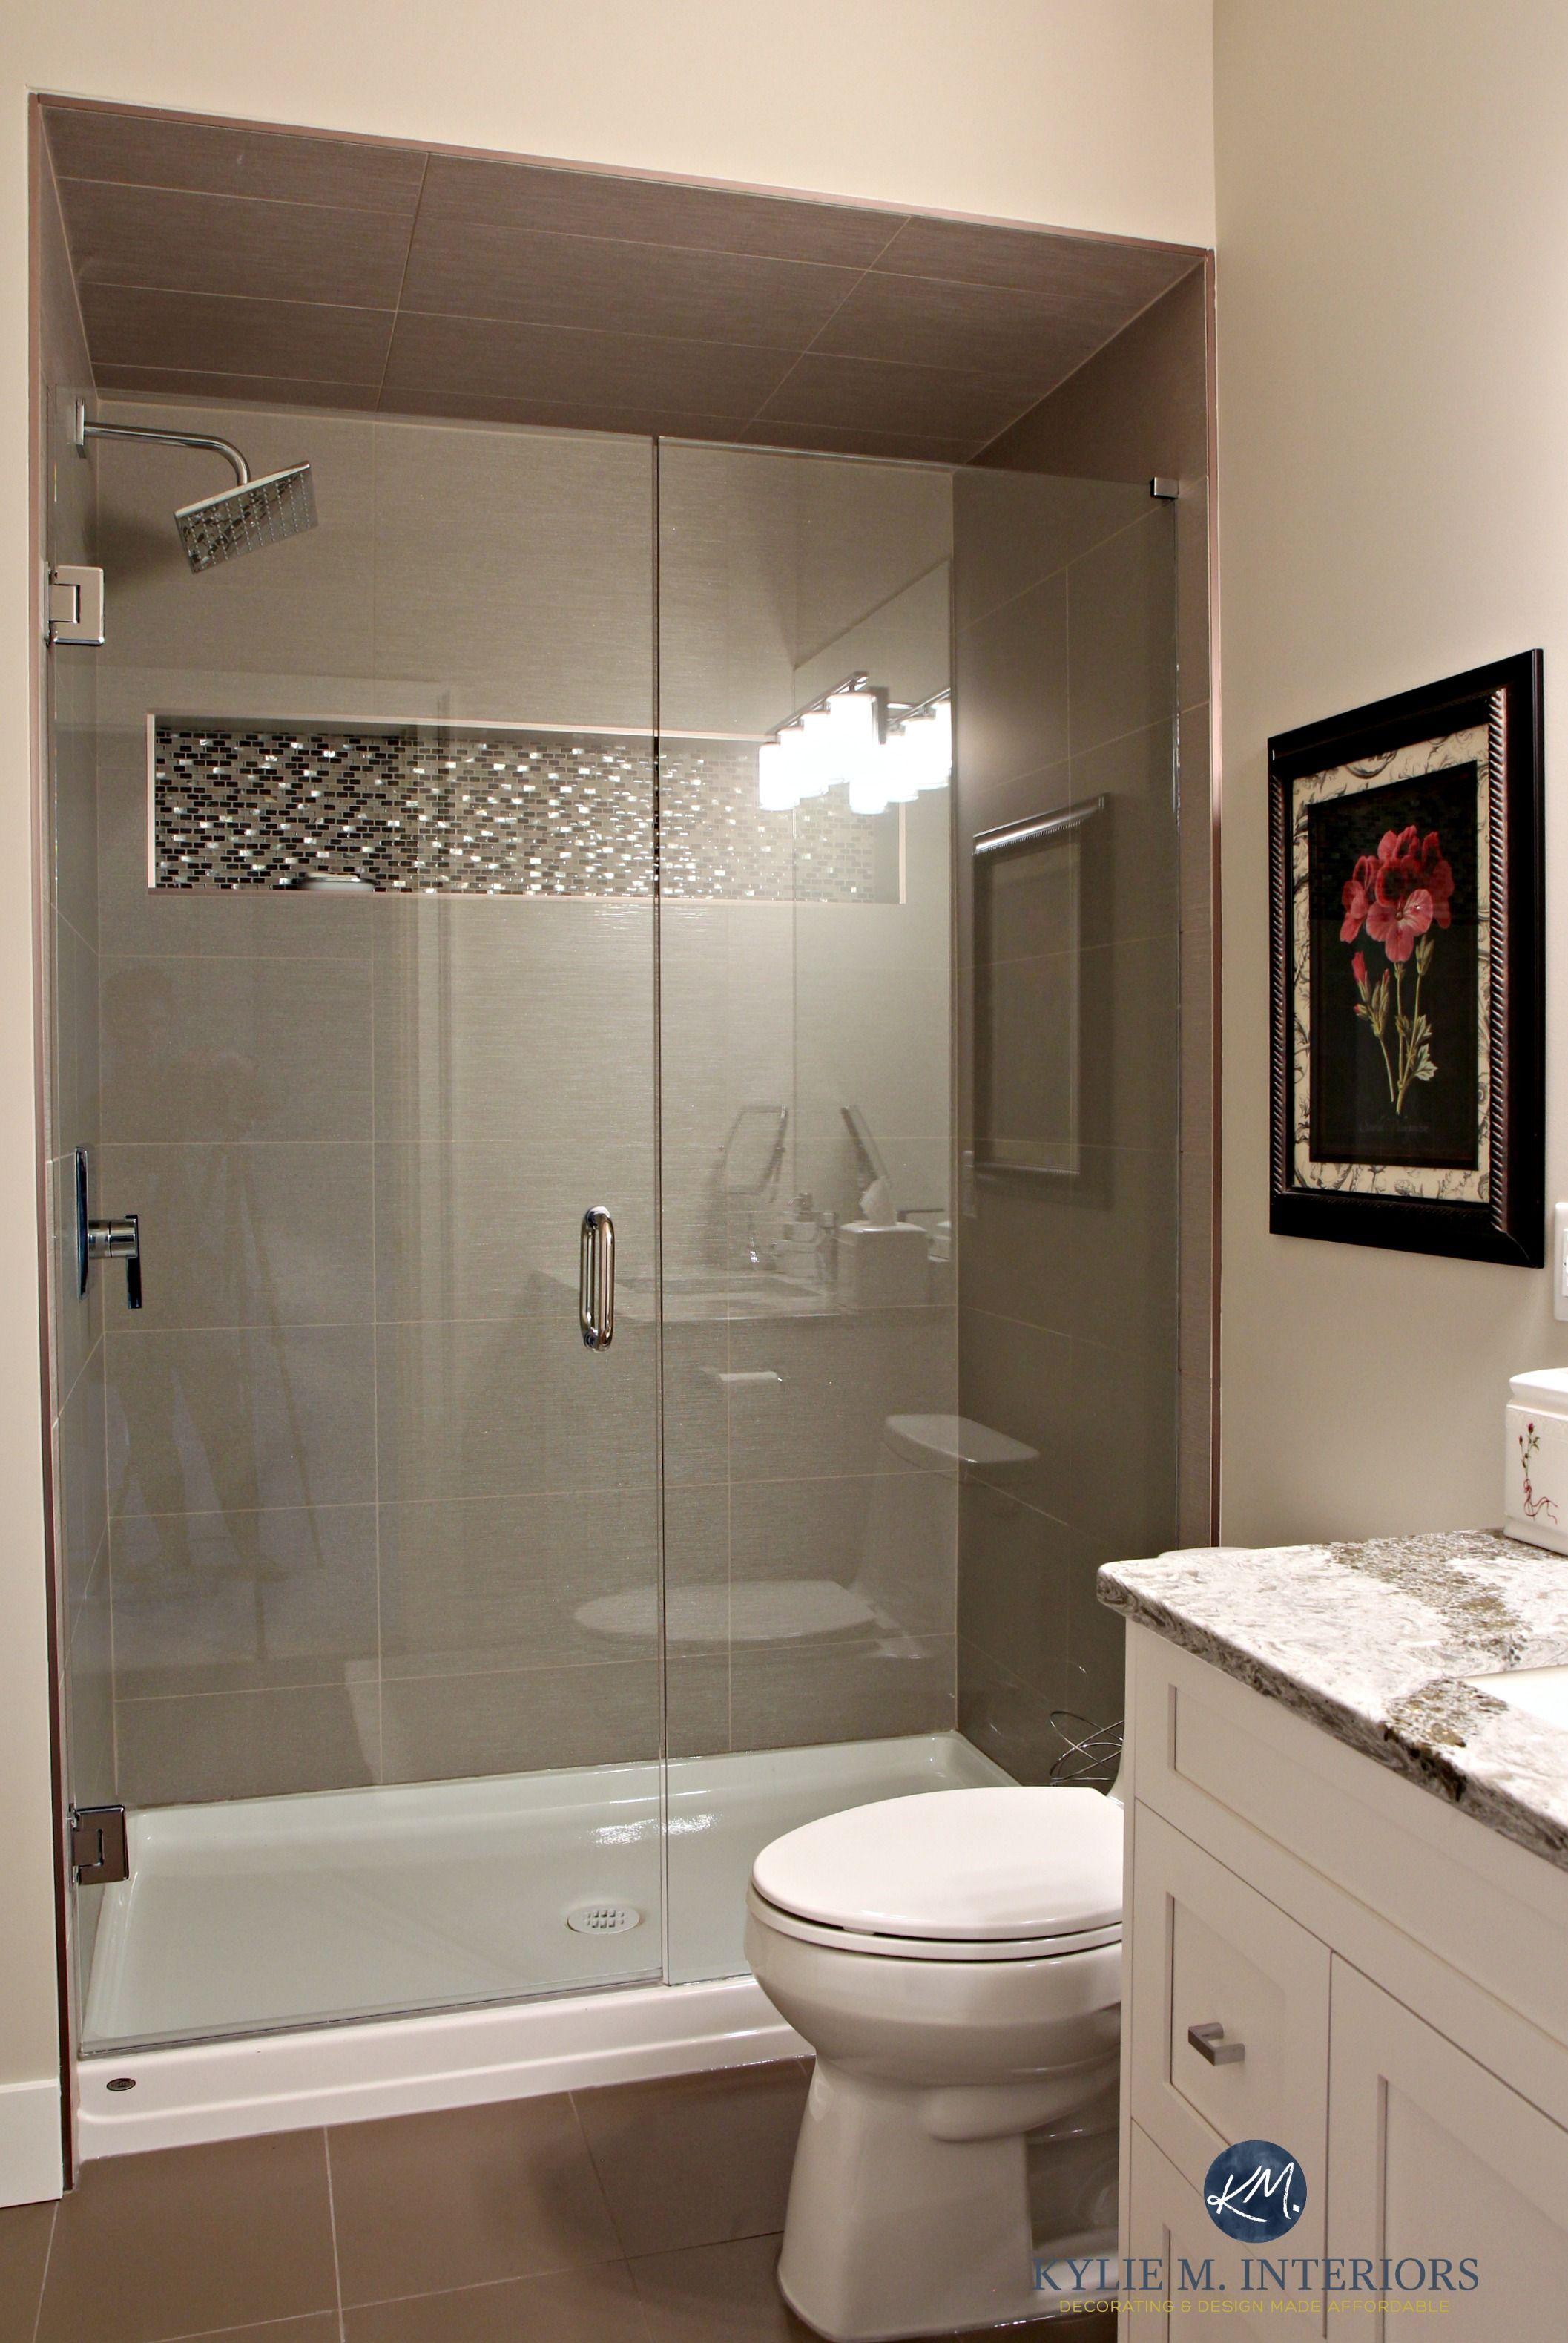 Best solutions of 2018: bathroom design 50 photo ideas